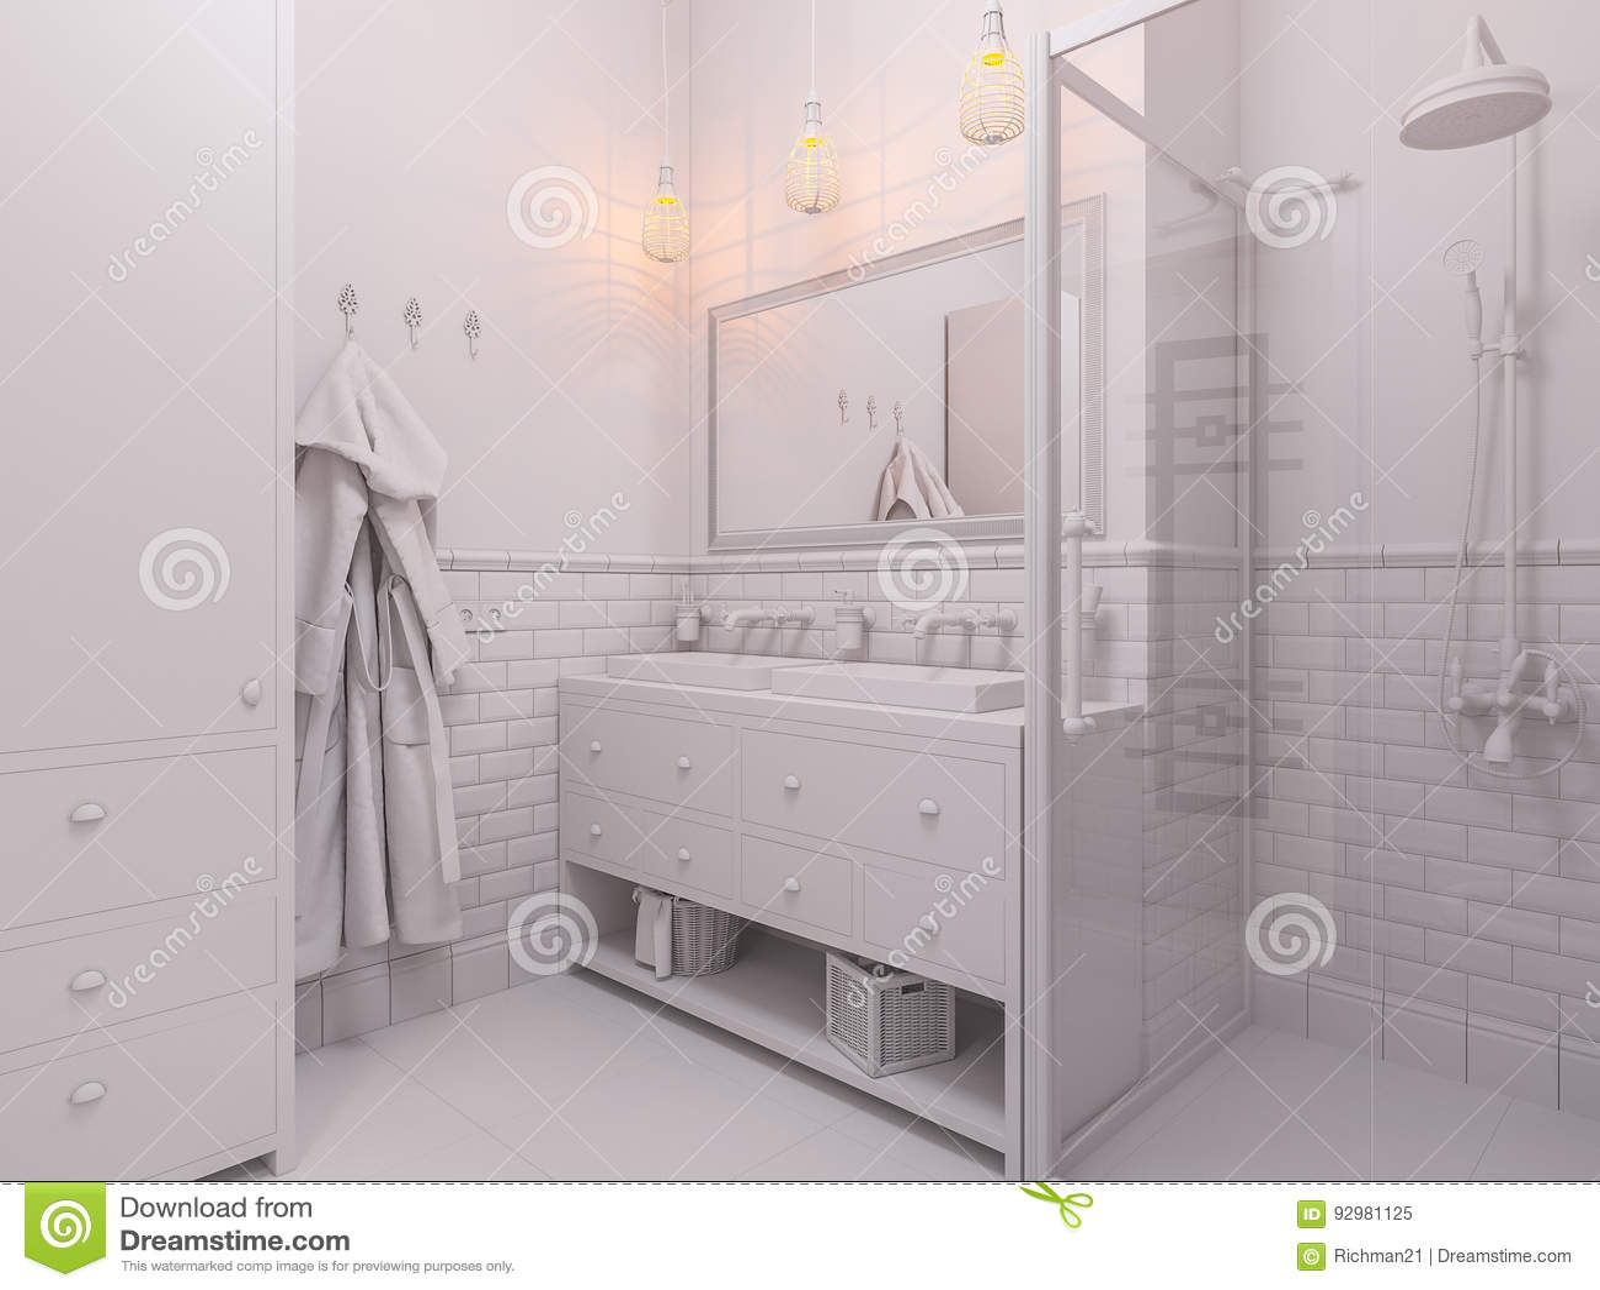 3d Illustration Of A Interior Design Bathroom Stock Illustration ...